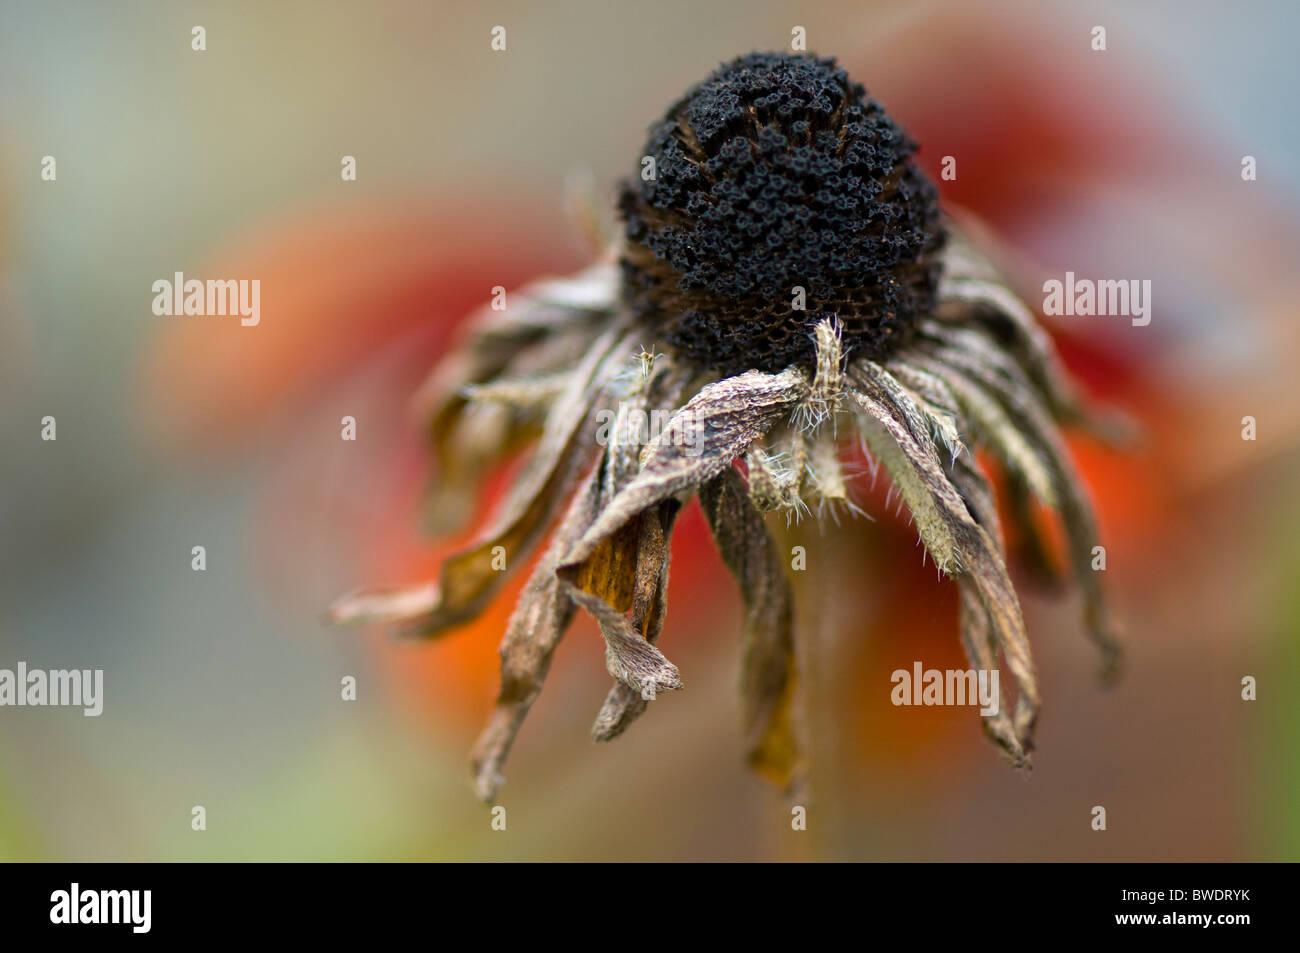 Dead Rudbeckia hirta flower head - Stock Image